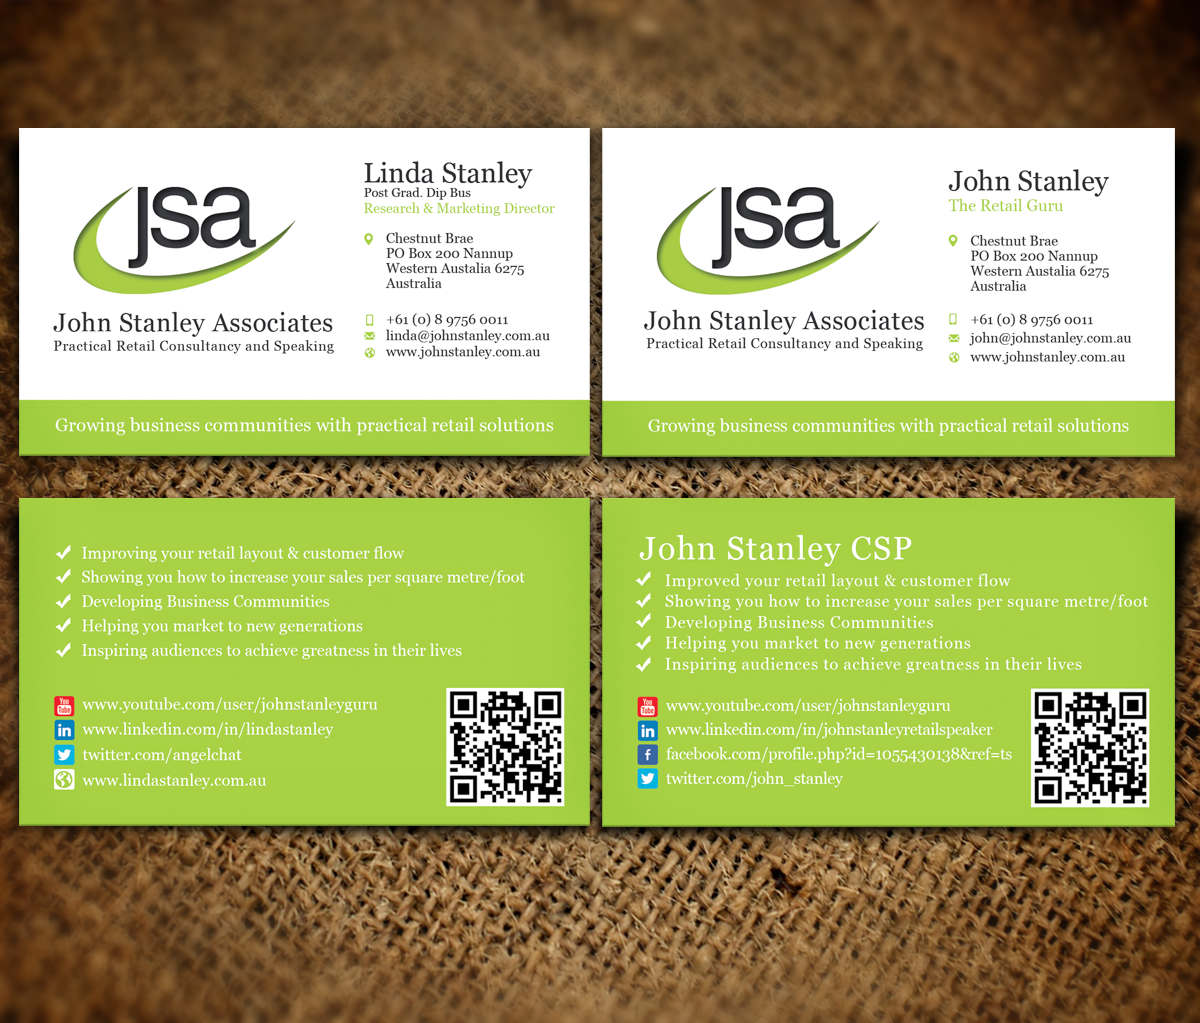 Elegant serious training business card design for john stanley business card design by nelsur for john stanley associates design 2666051 colourmoves Images